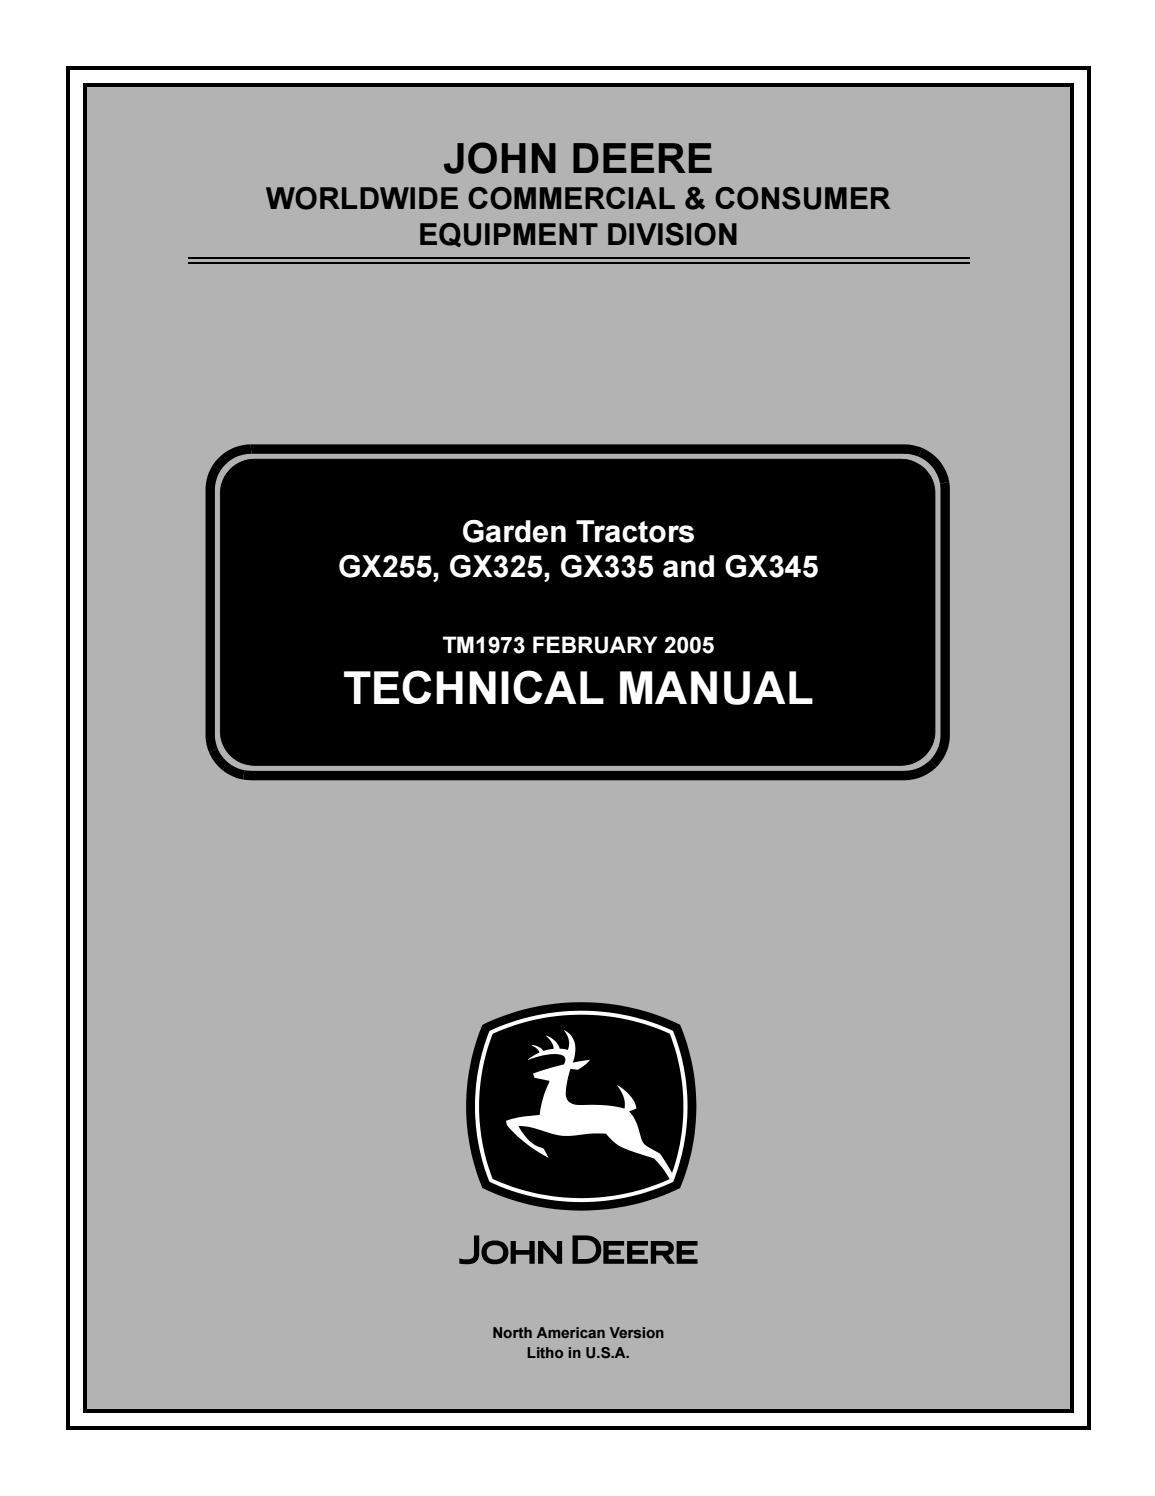 John deere gx255 lawn garden tractor service repair manual